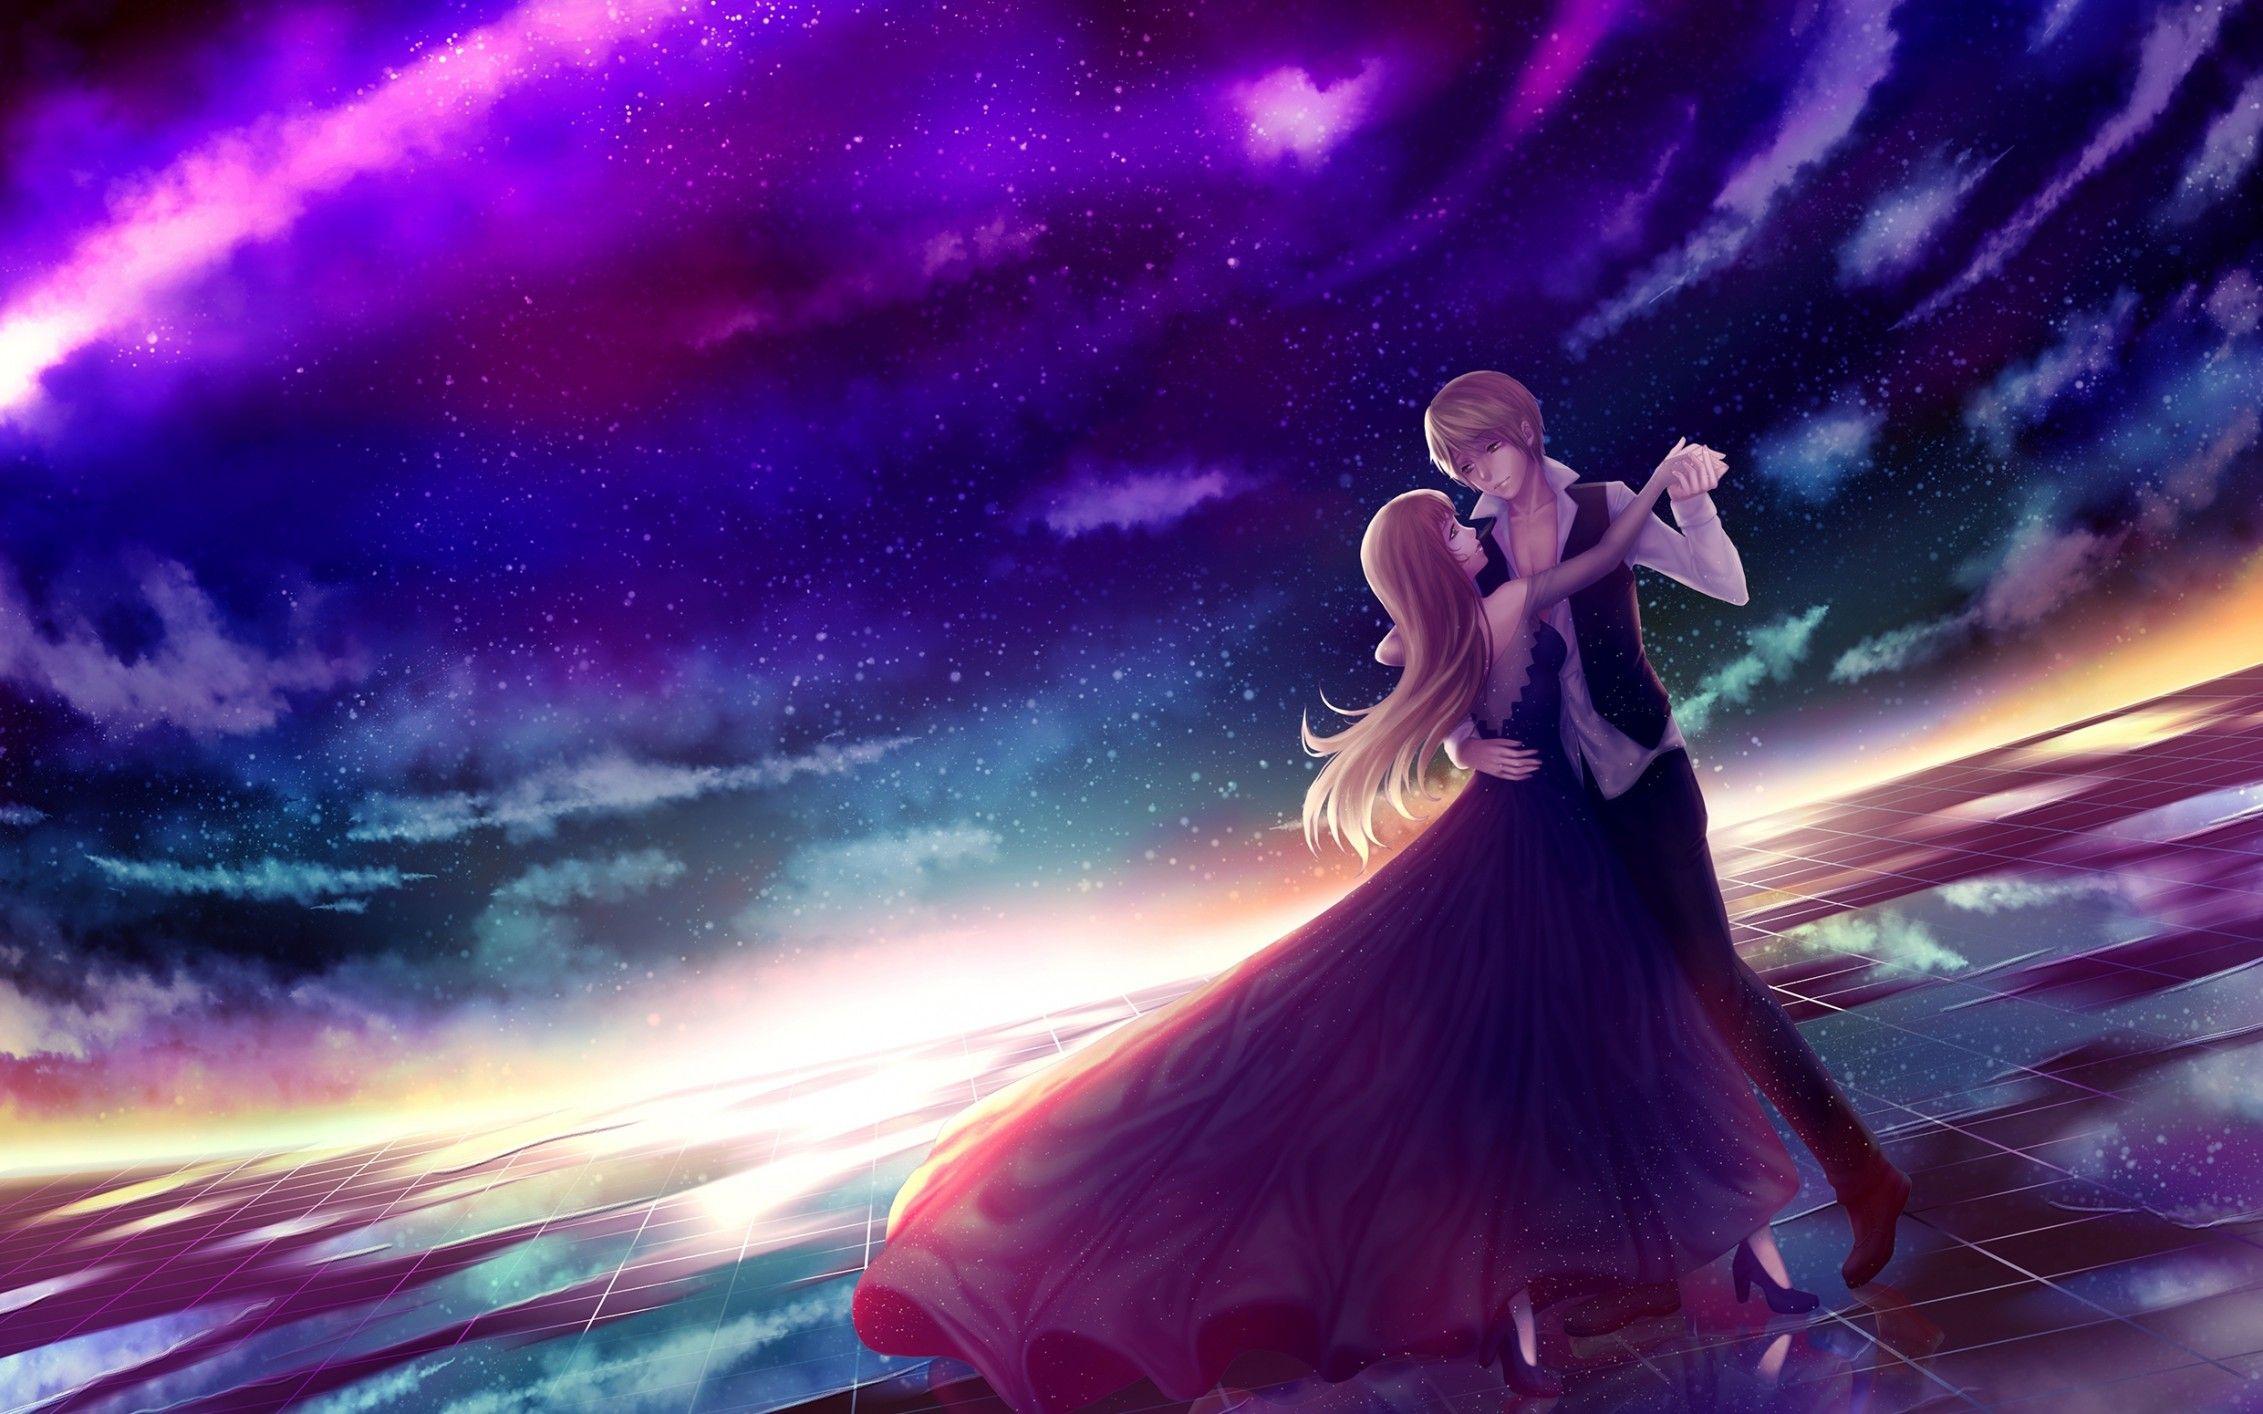 Pin On Wallpaper Download wallpaper anime couple hd